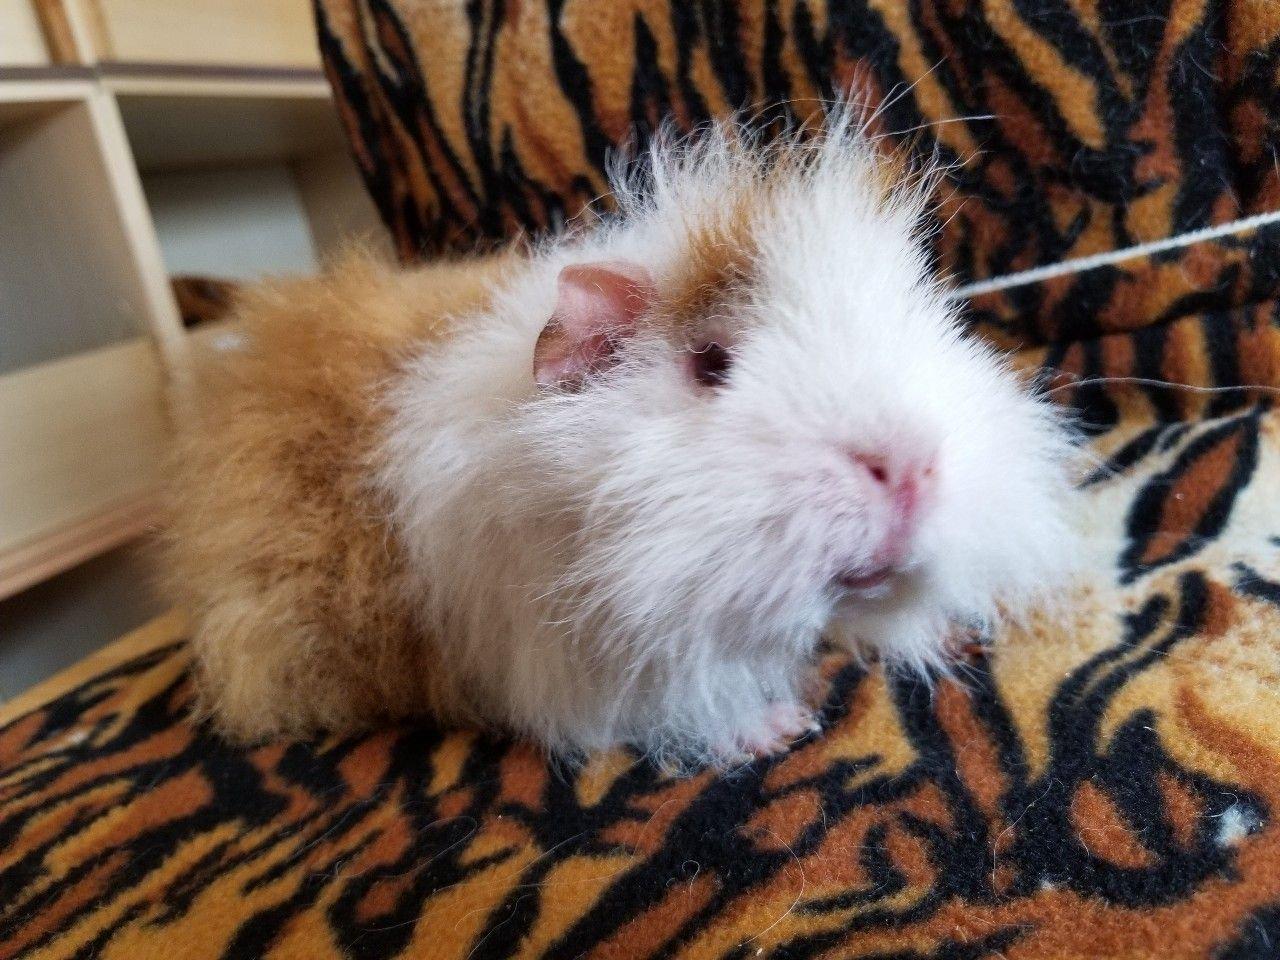 Young Adult Minipli Breeding Sow Pet Home 233637 Uk Pets